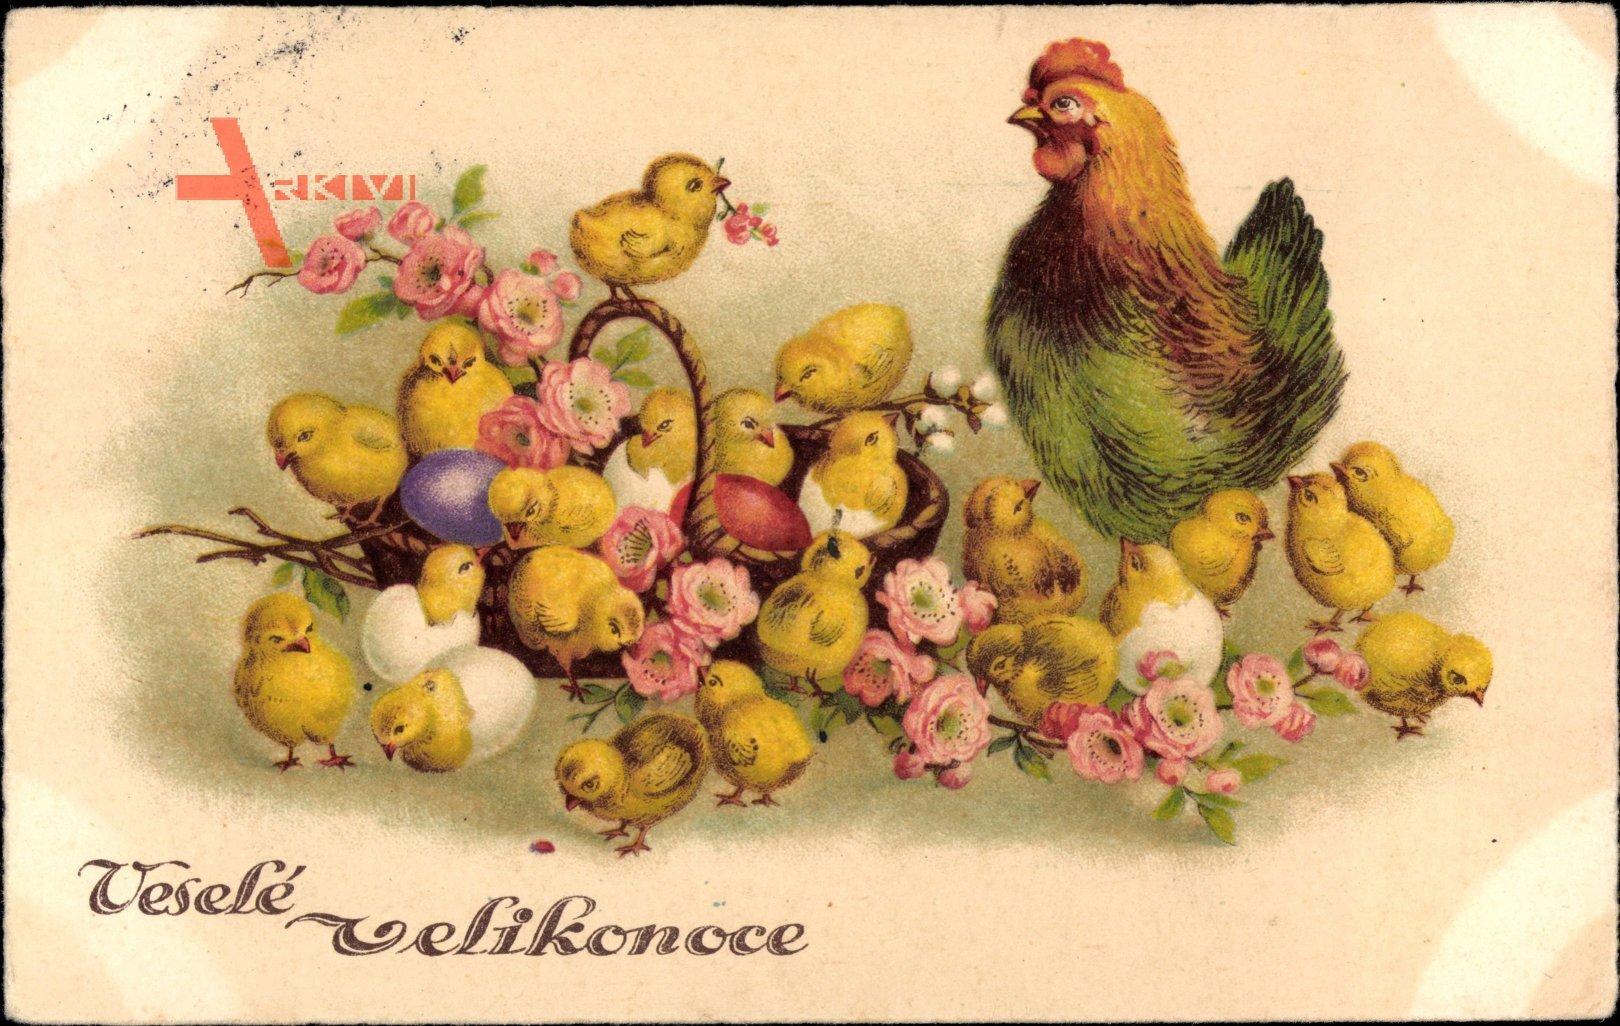 Glückwunsch Ostern, Vesele velikonoce, Küken, Henne, Ostereier, Tschechisch